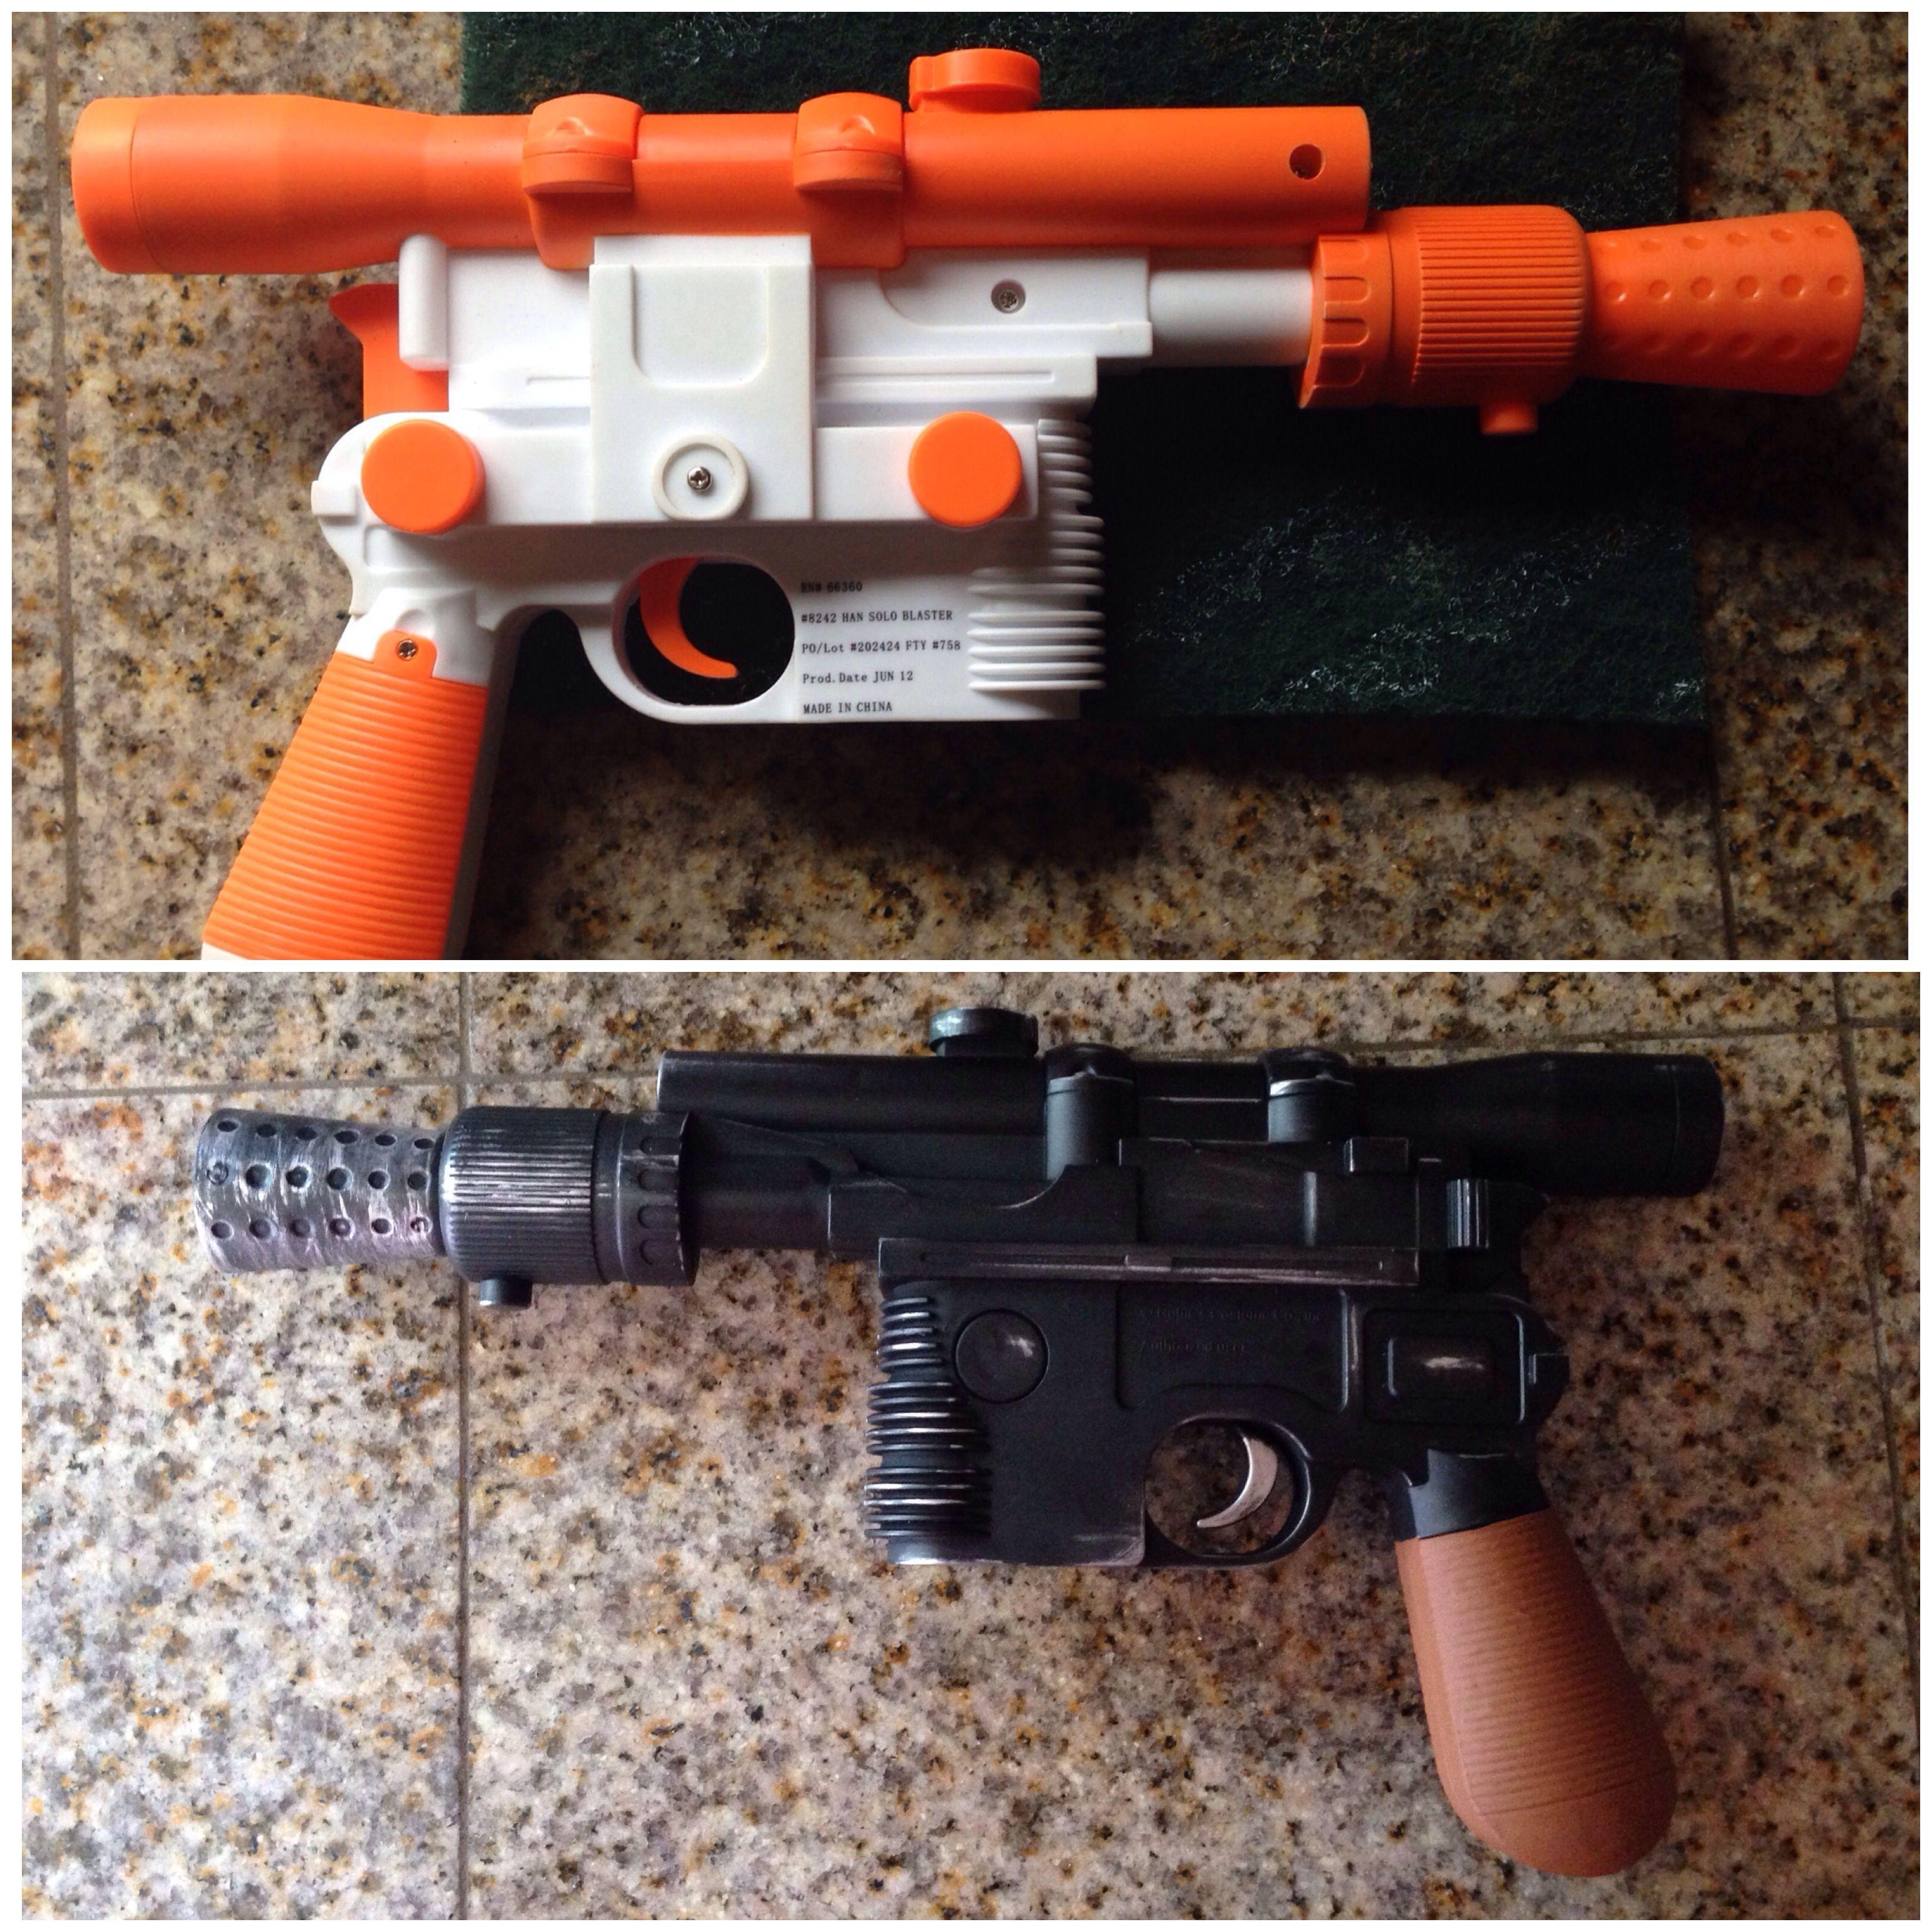 Han Solo Blaster 1. Sand 2. Spray paint black 3. Rub n' Buff silver for distressing 4. Paint handle brown 5. Matte spray finish